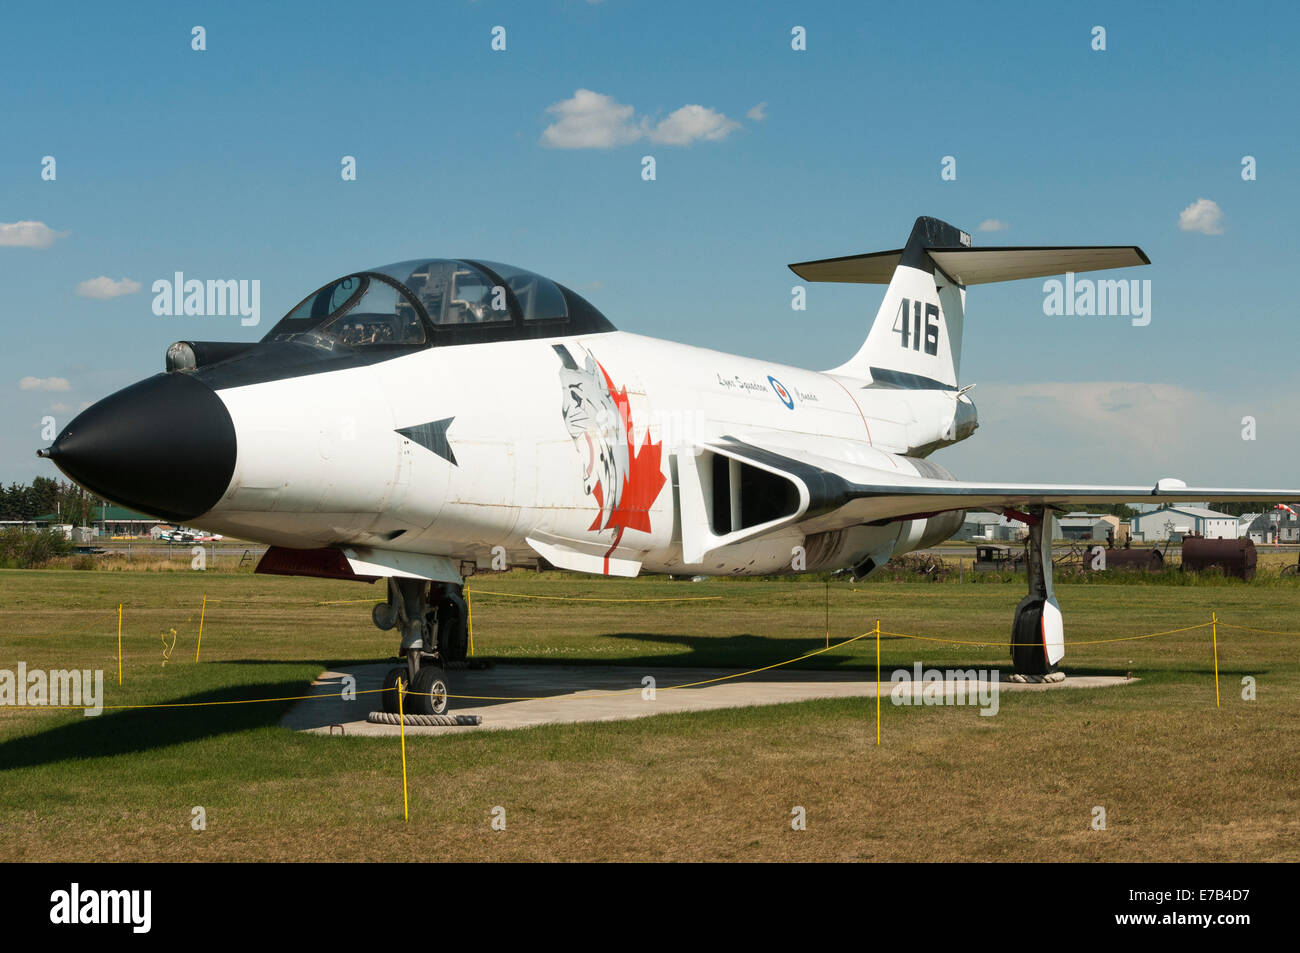 Elk203-5699 Canada, Alberta, Wetaskiwin, Reynolds-Alberta Museum, vintage fighter jets Stock Photo